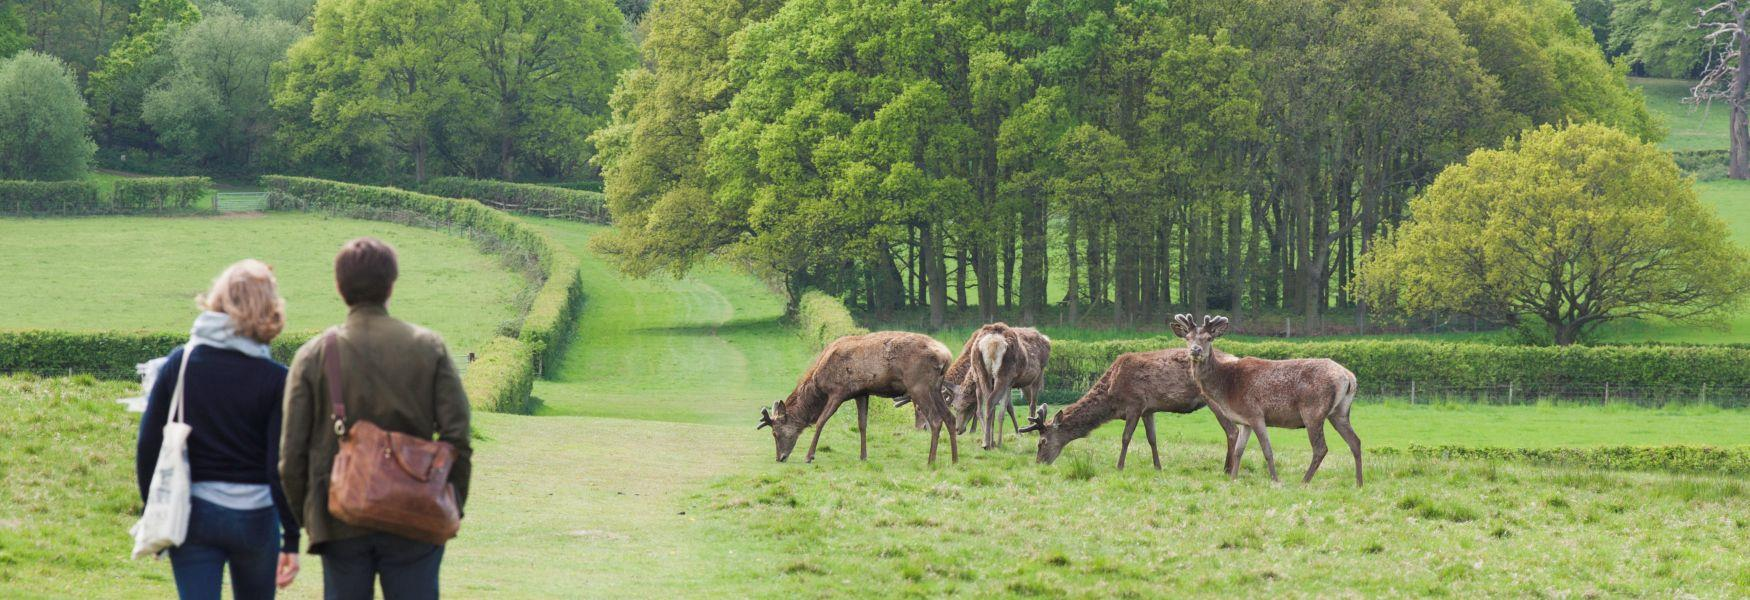 Walkers and deer in Windsor Great Park